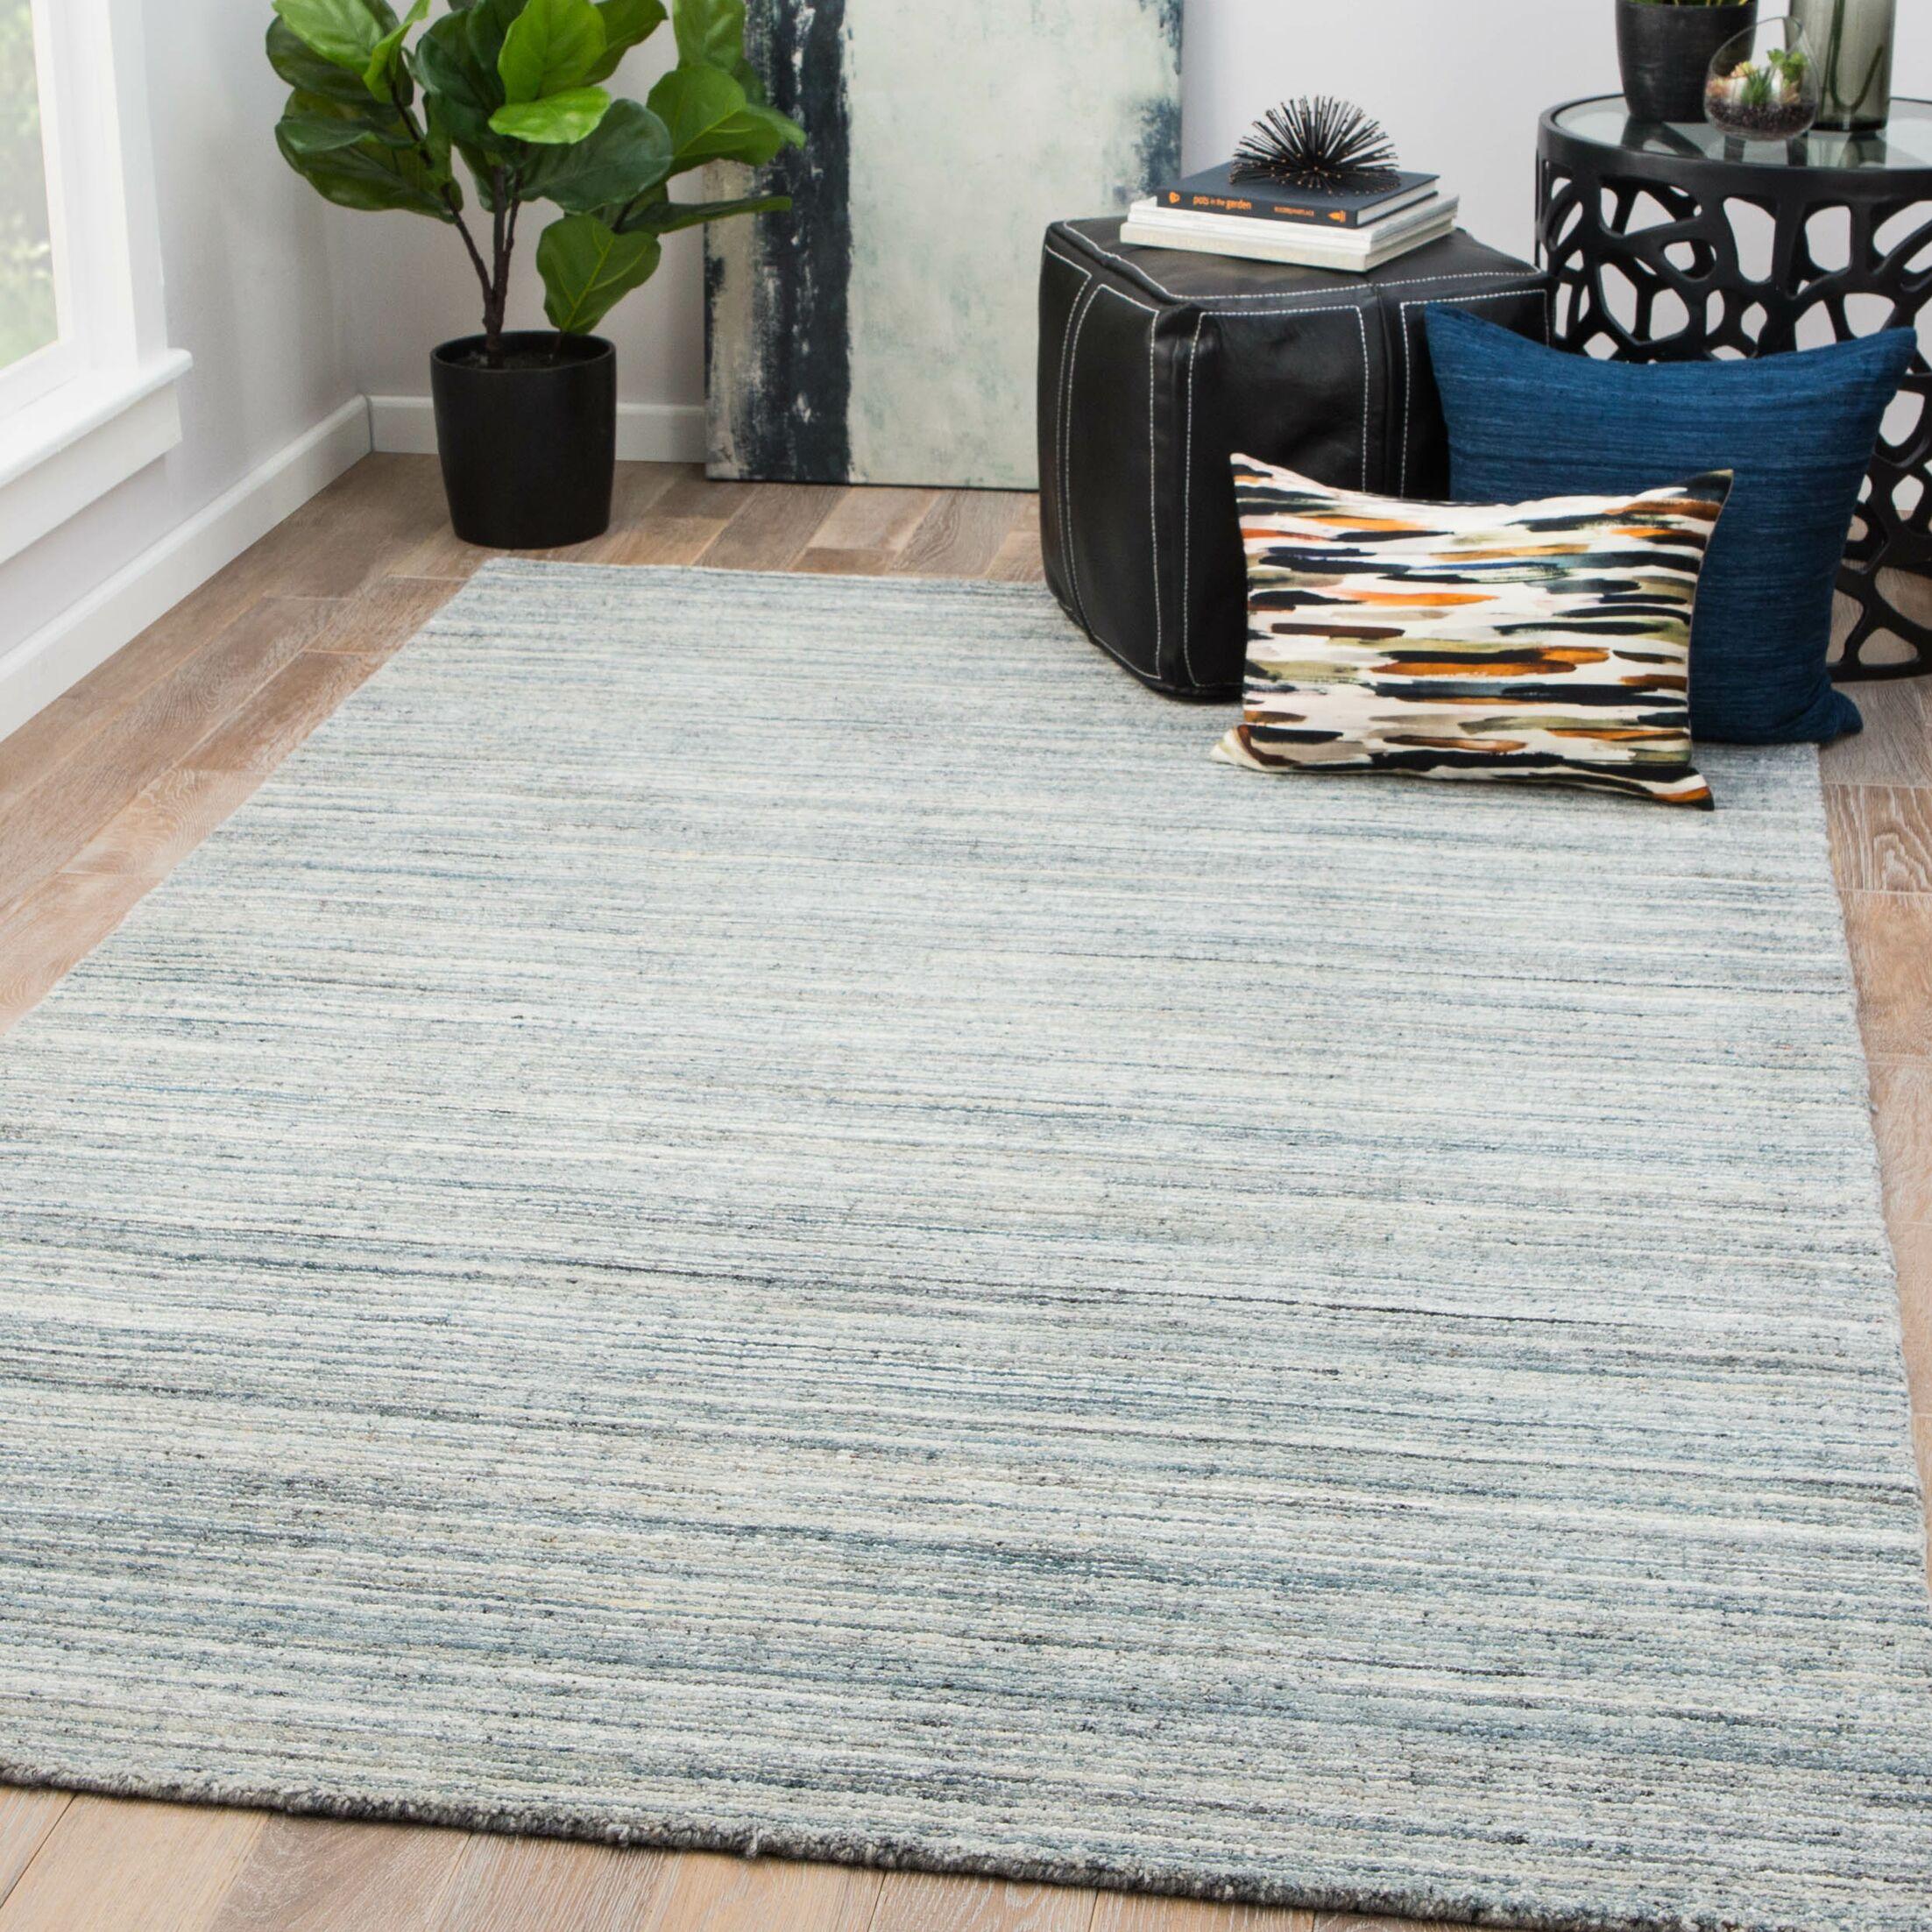 Schmit Hand-Woven Wool Citadel/Blue Mirage Area Rug Rug Size: Rectangle 9' x 13'